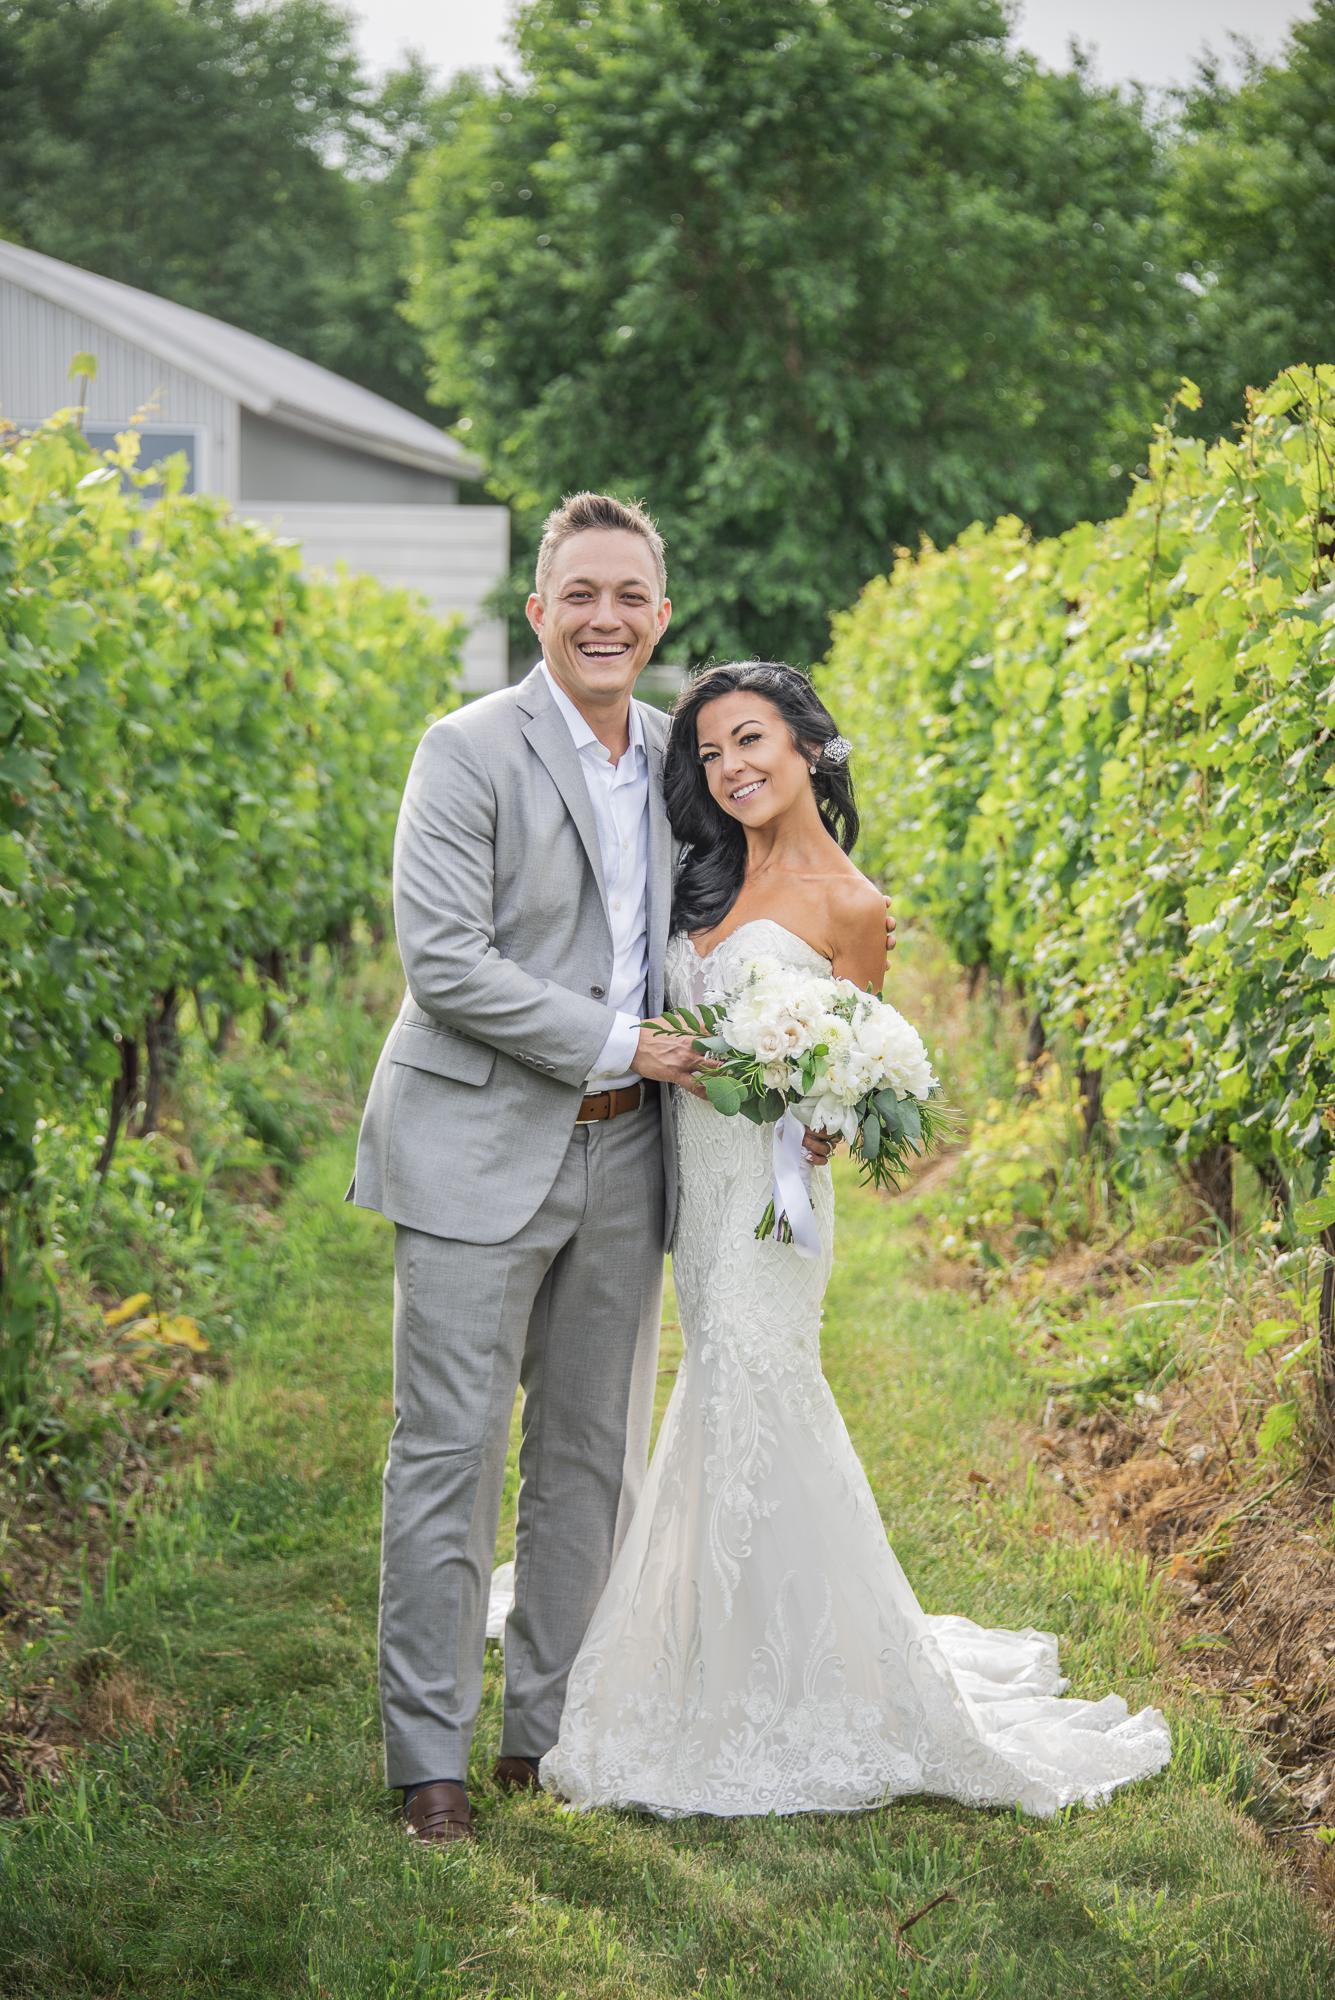 Ashley and Patrick Flynn-20180721-3156-RT-2000.jpg